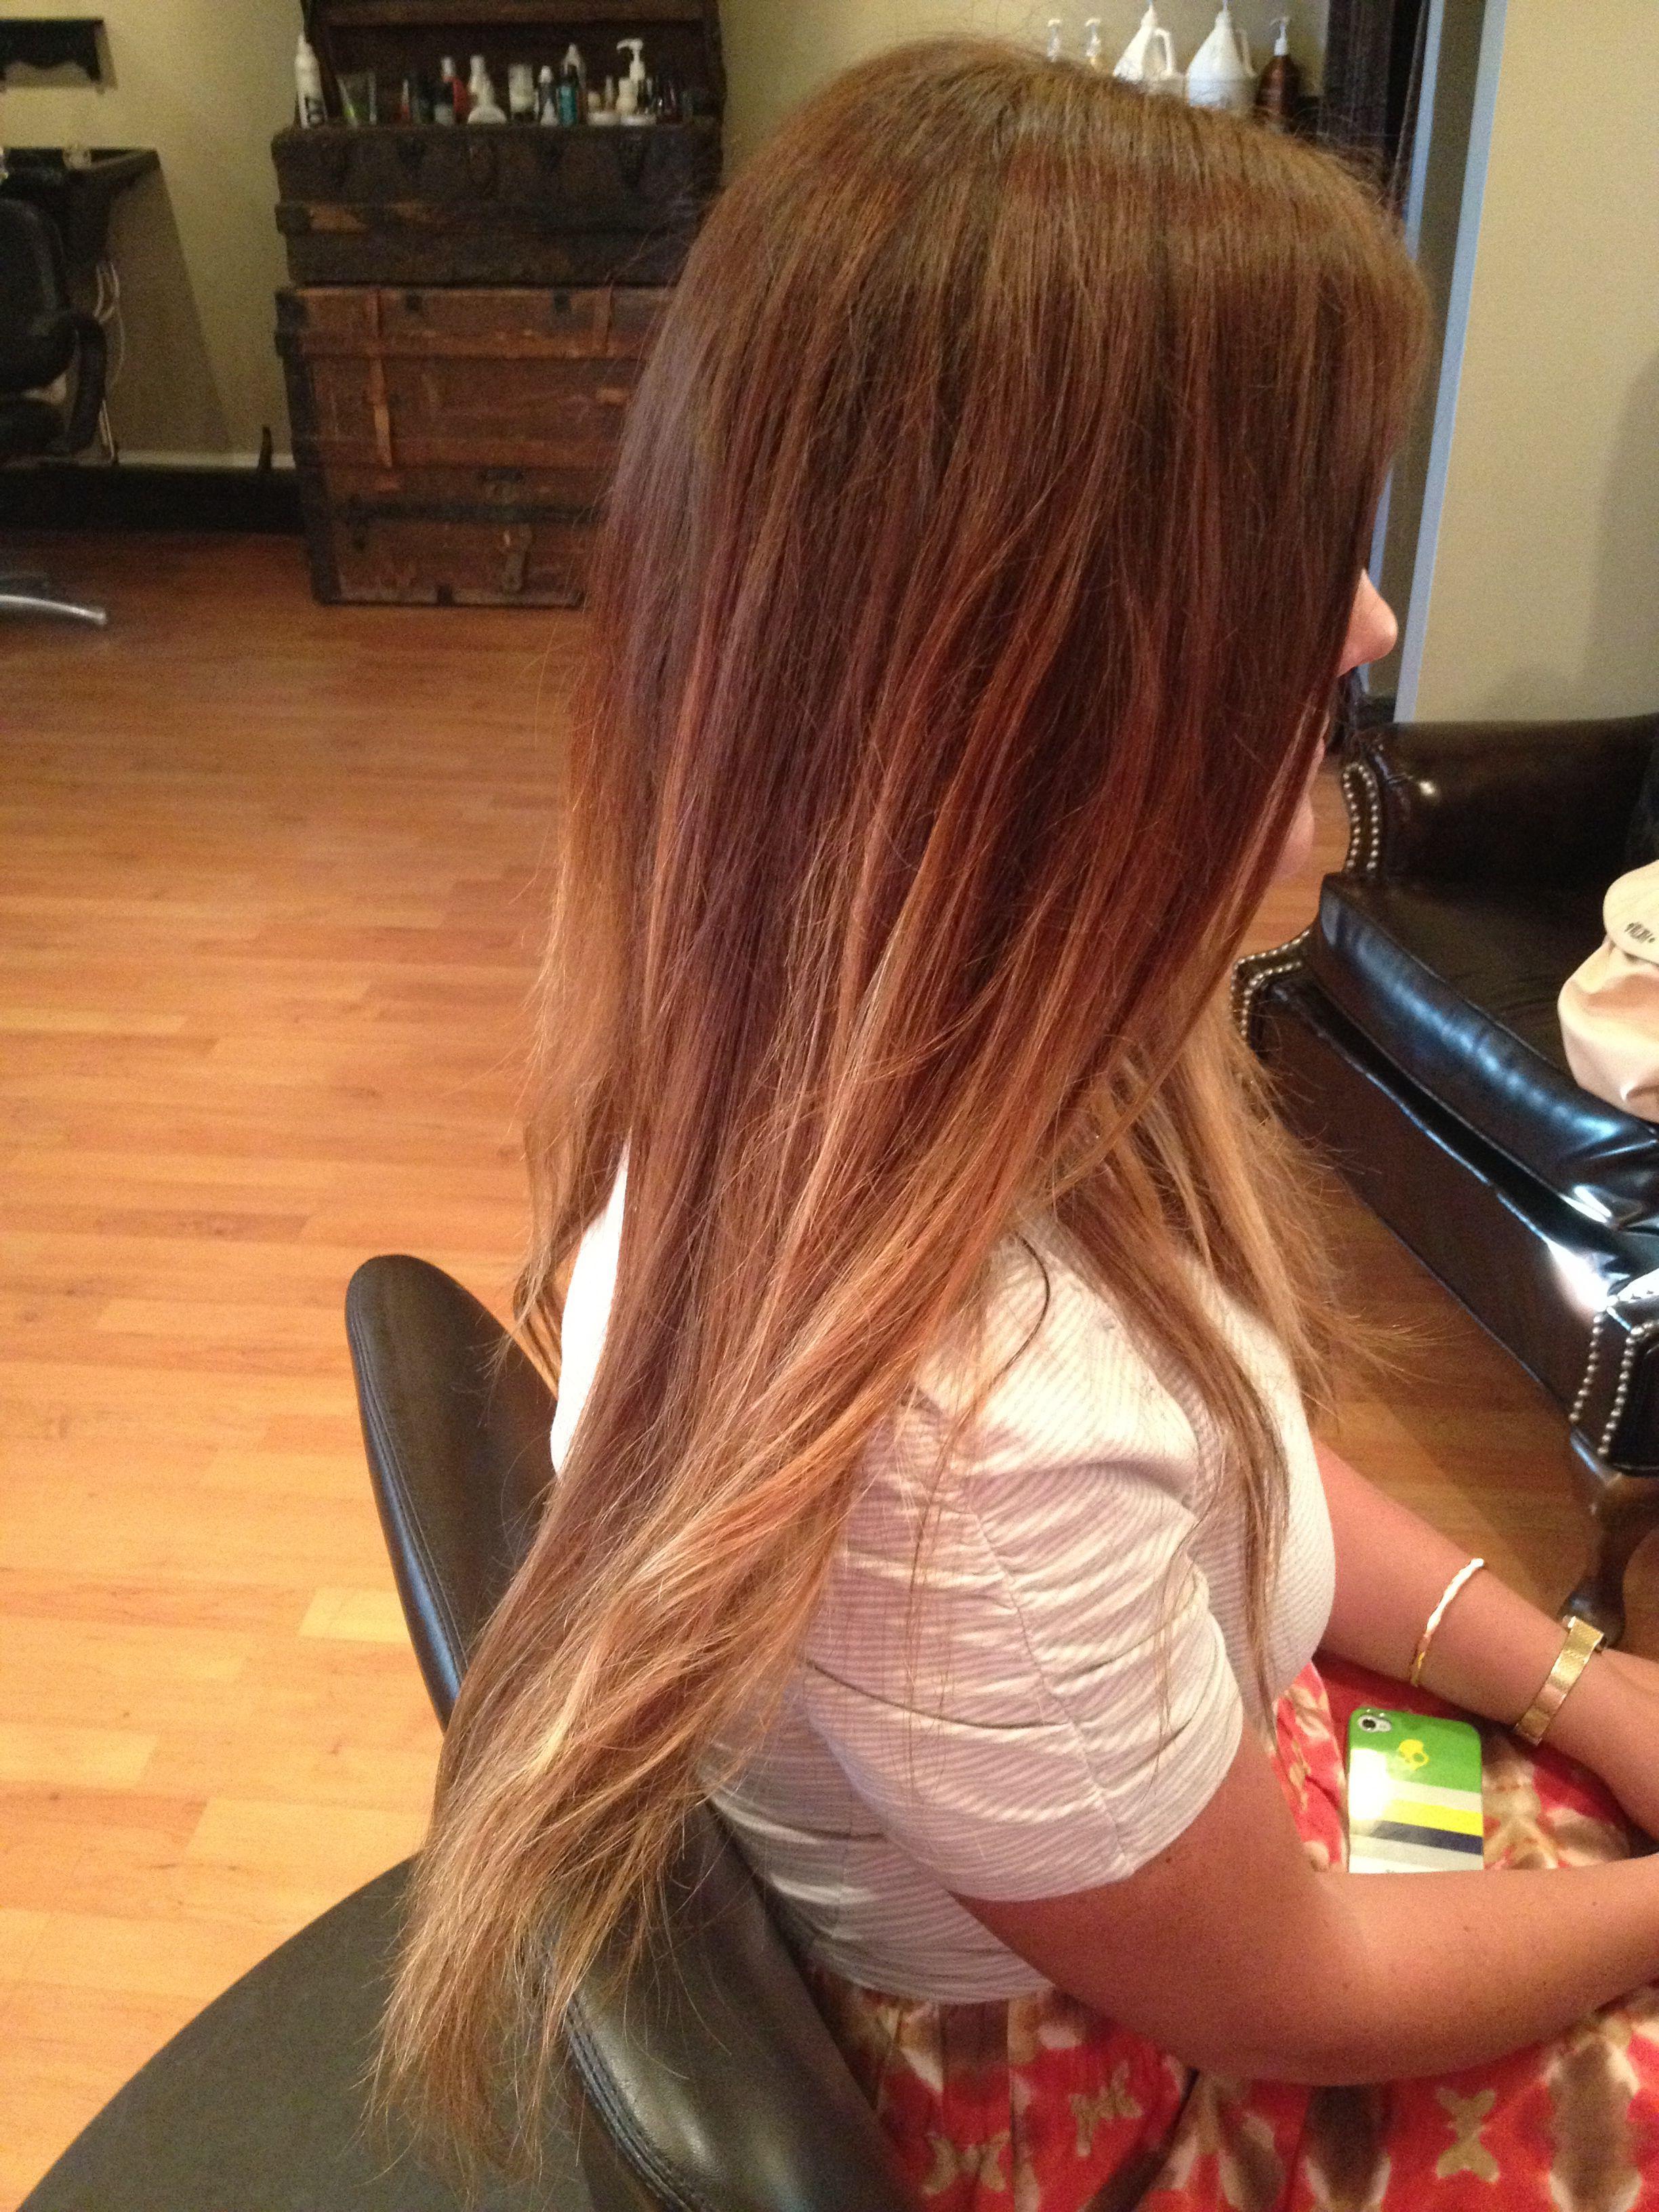 Hair by Soula